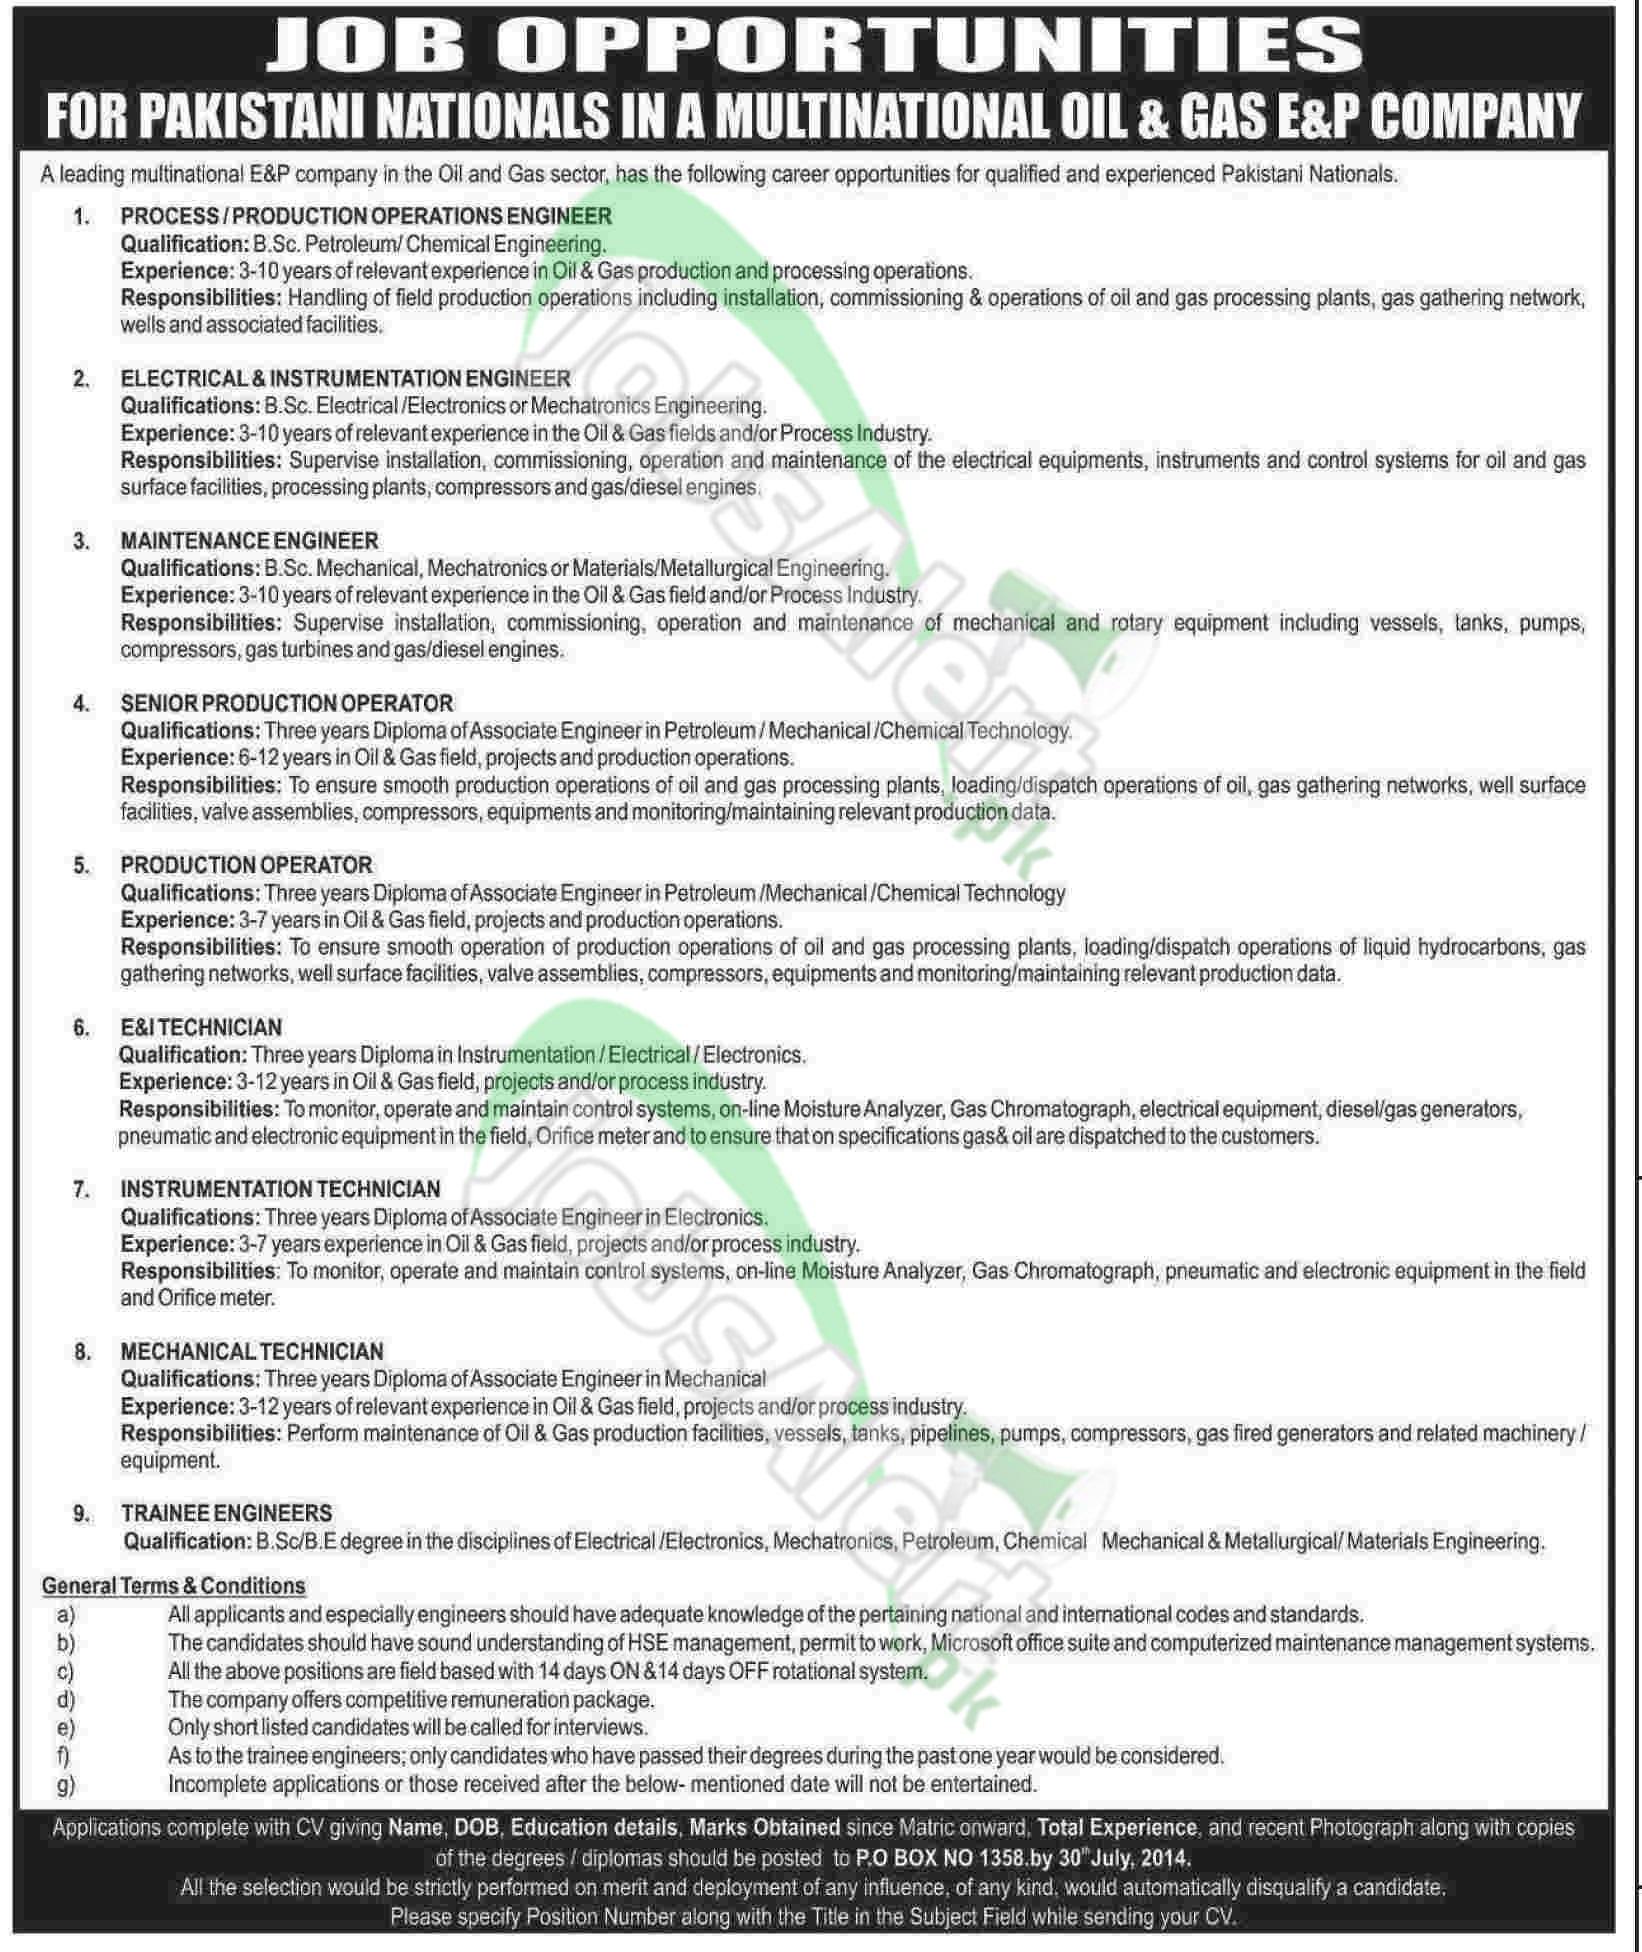 Multinational Oil & Gas E&P Company, Pakistan